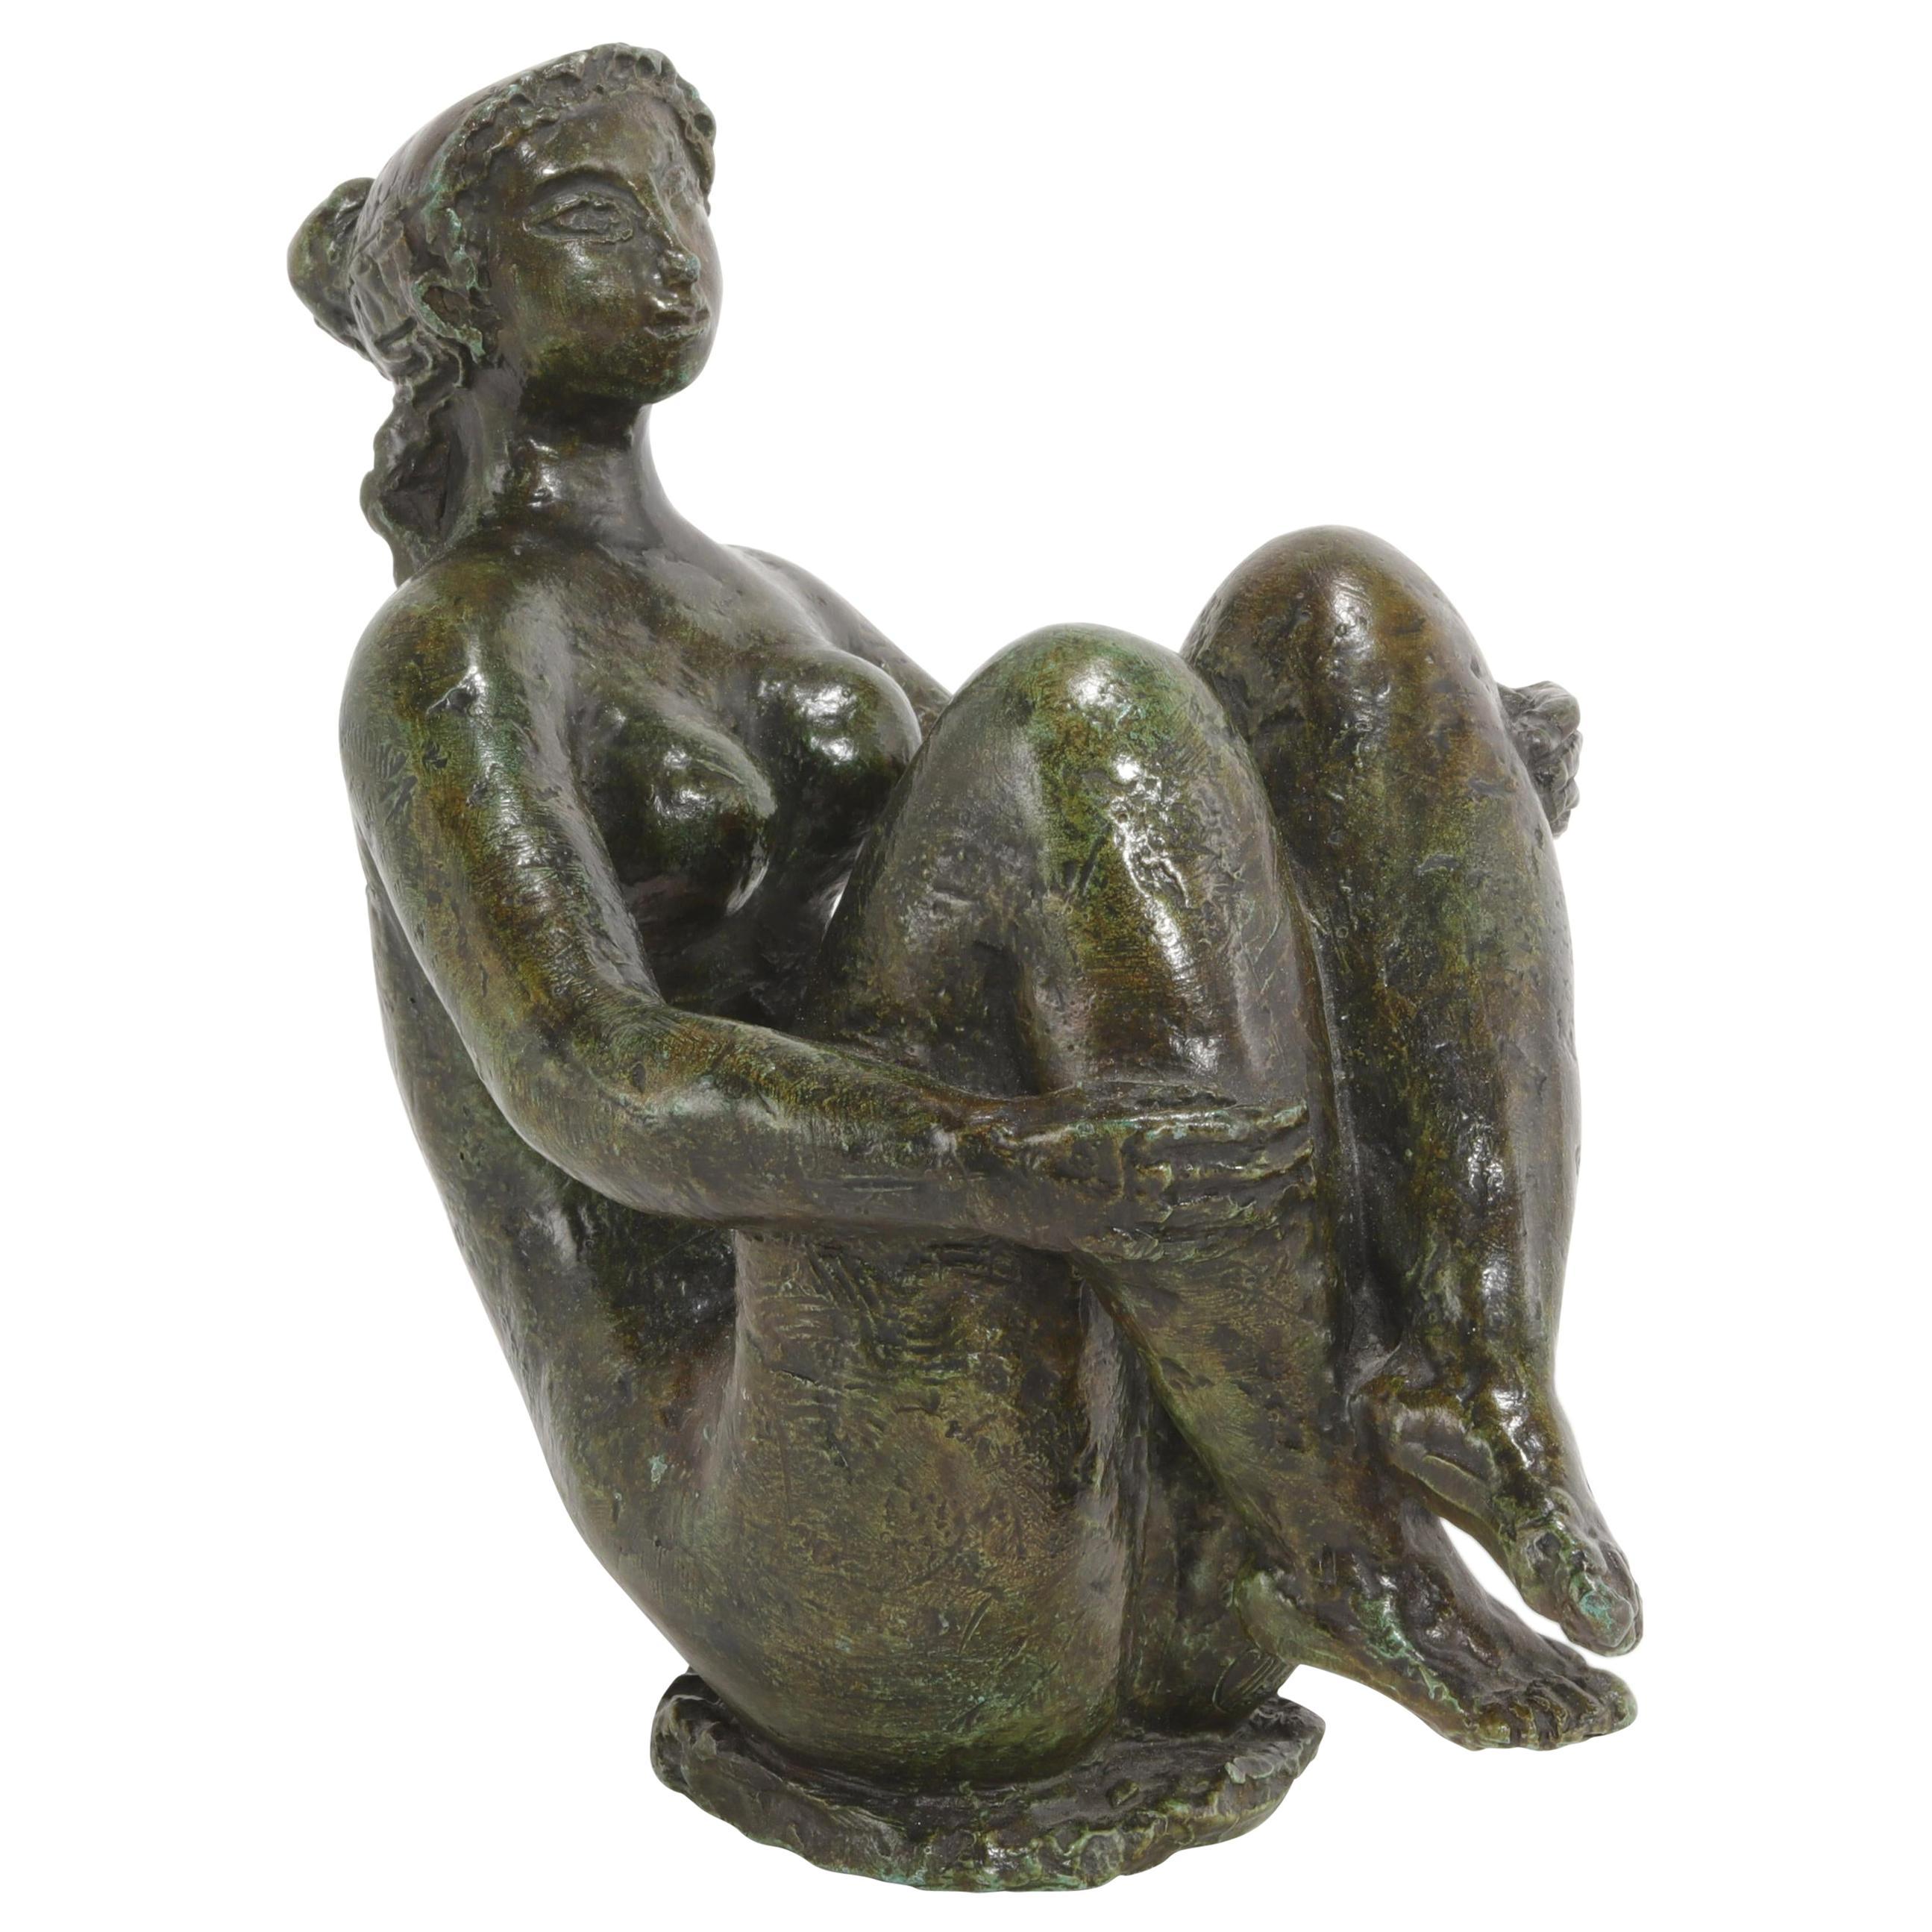 Antoniucci Volti, Sculpture in Bronze, 1970